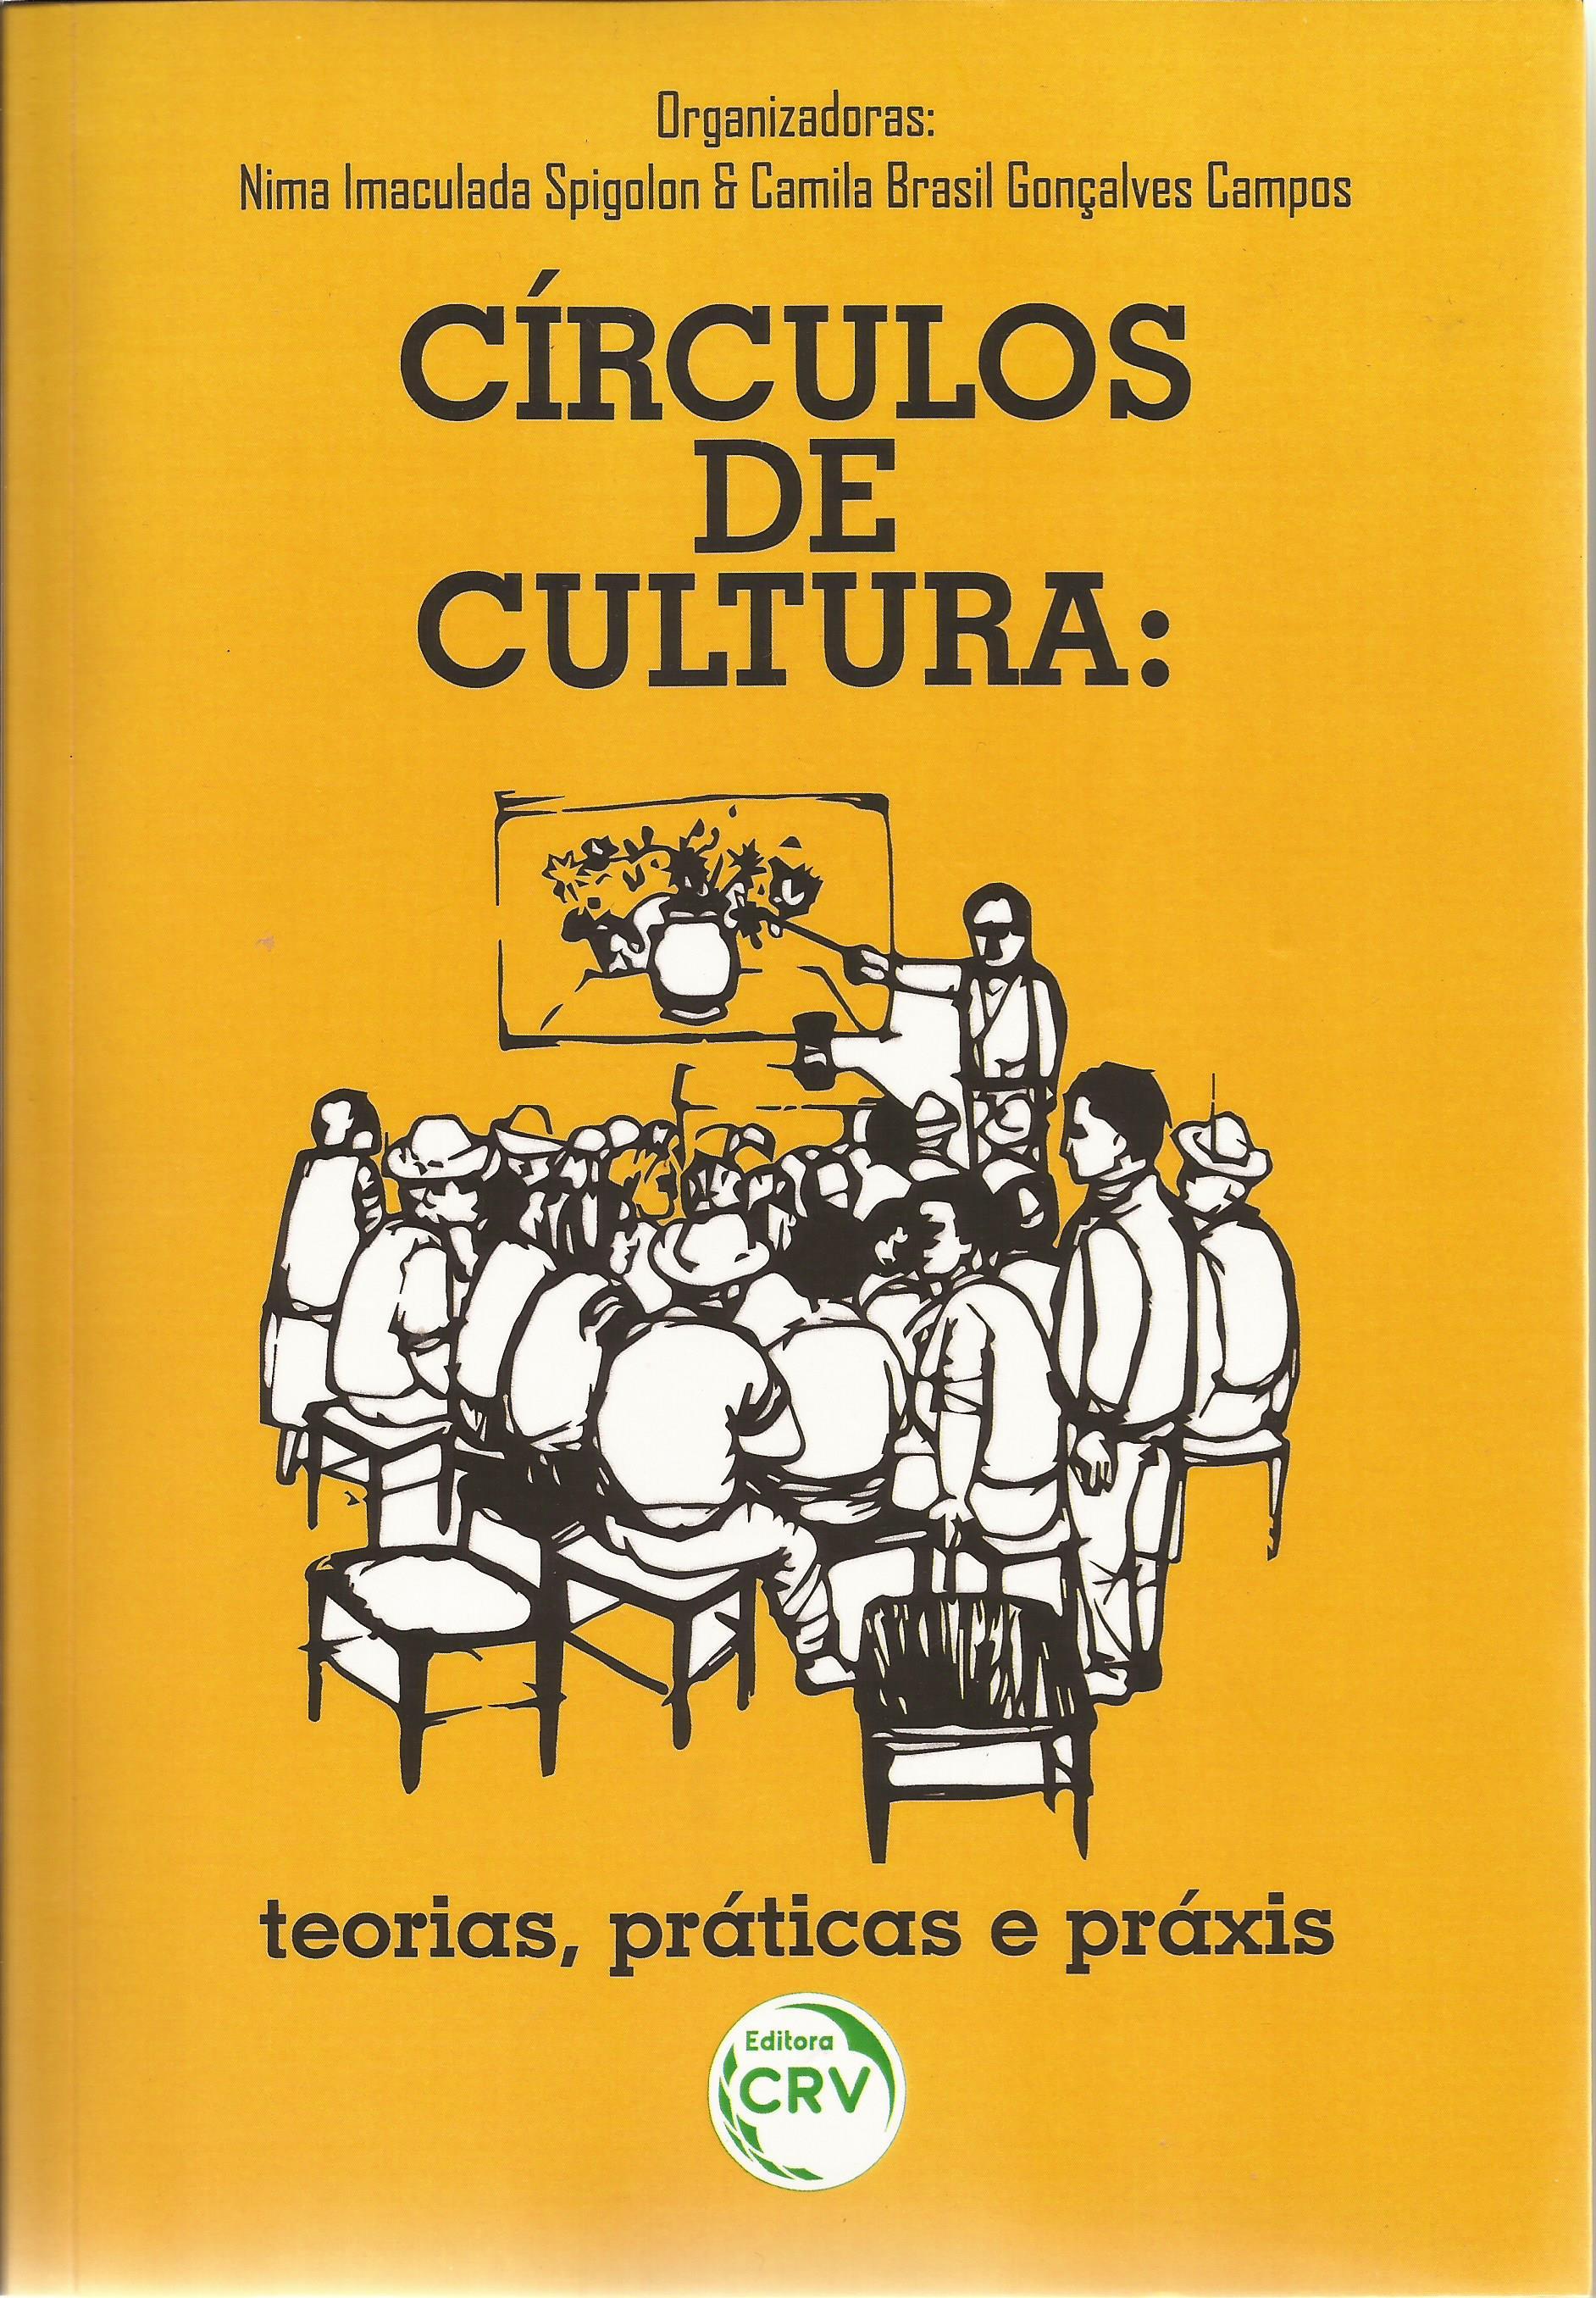 Círculos de Cultura: teorias, práticas e práxis